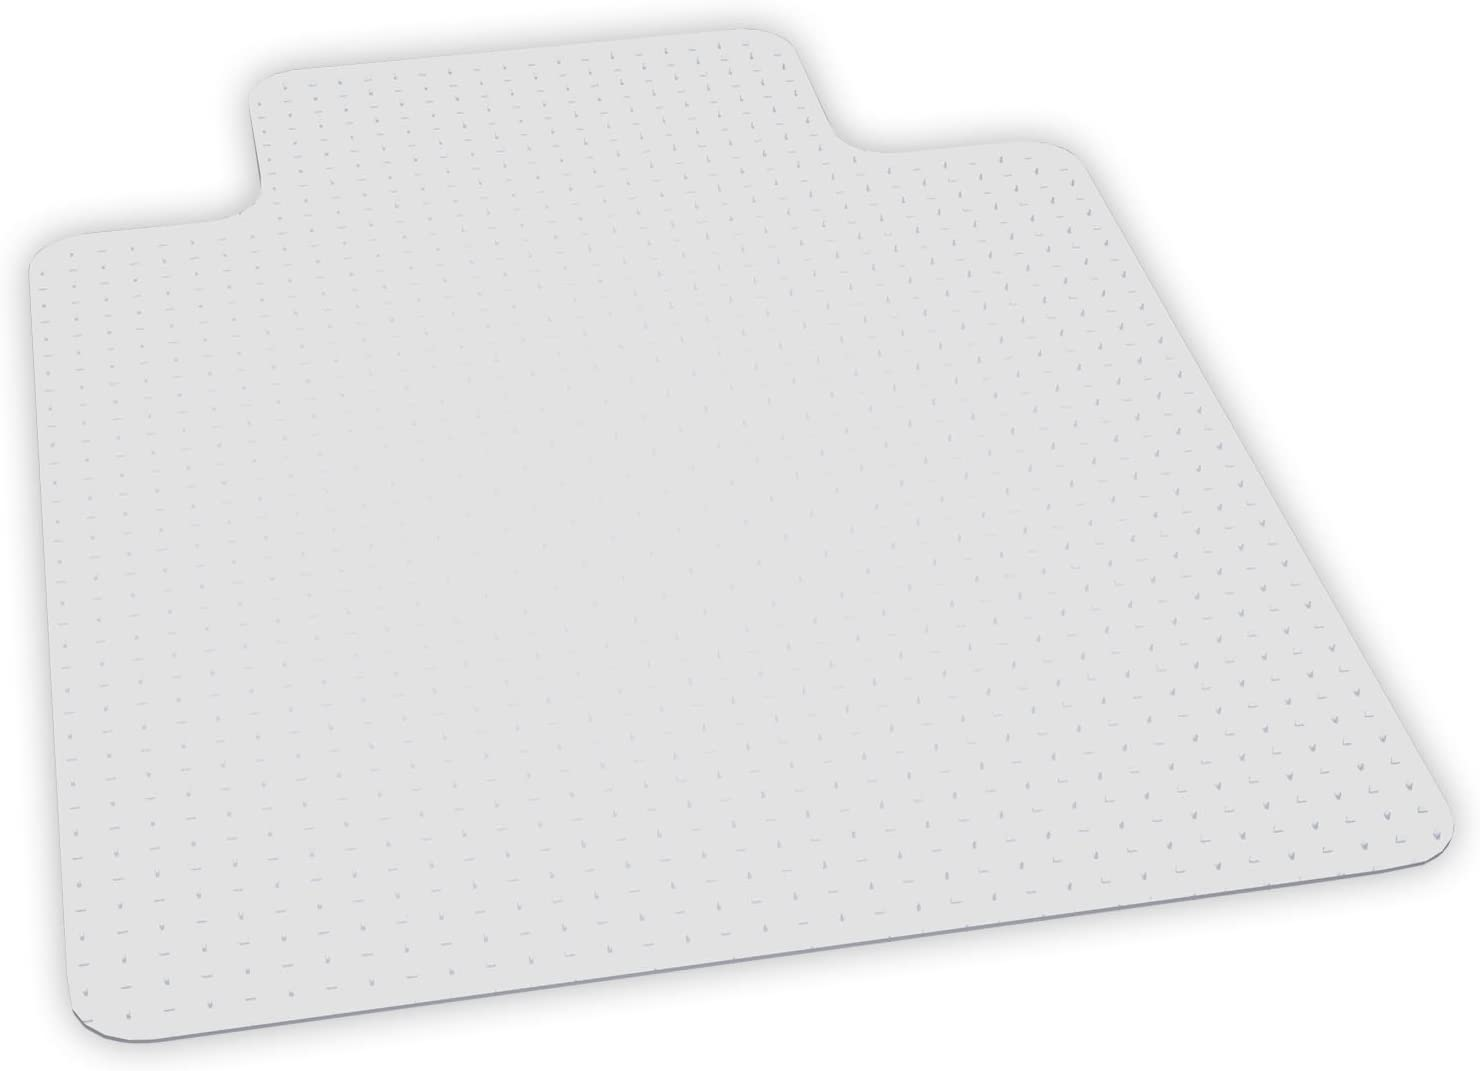 ES Robbins EverLife Anchor Bar Lipped Vinyl Chair Mat for High Pile Carpet, 46 by 60-Inch, Clear